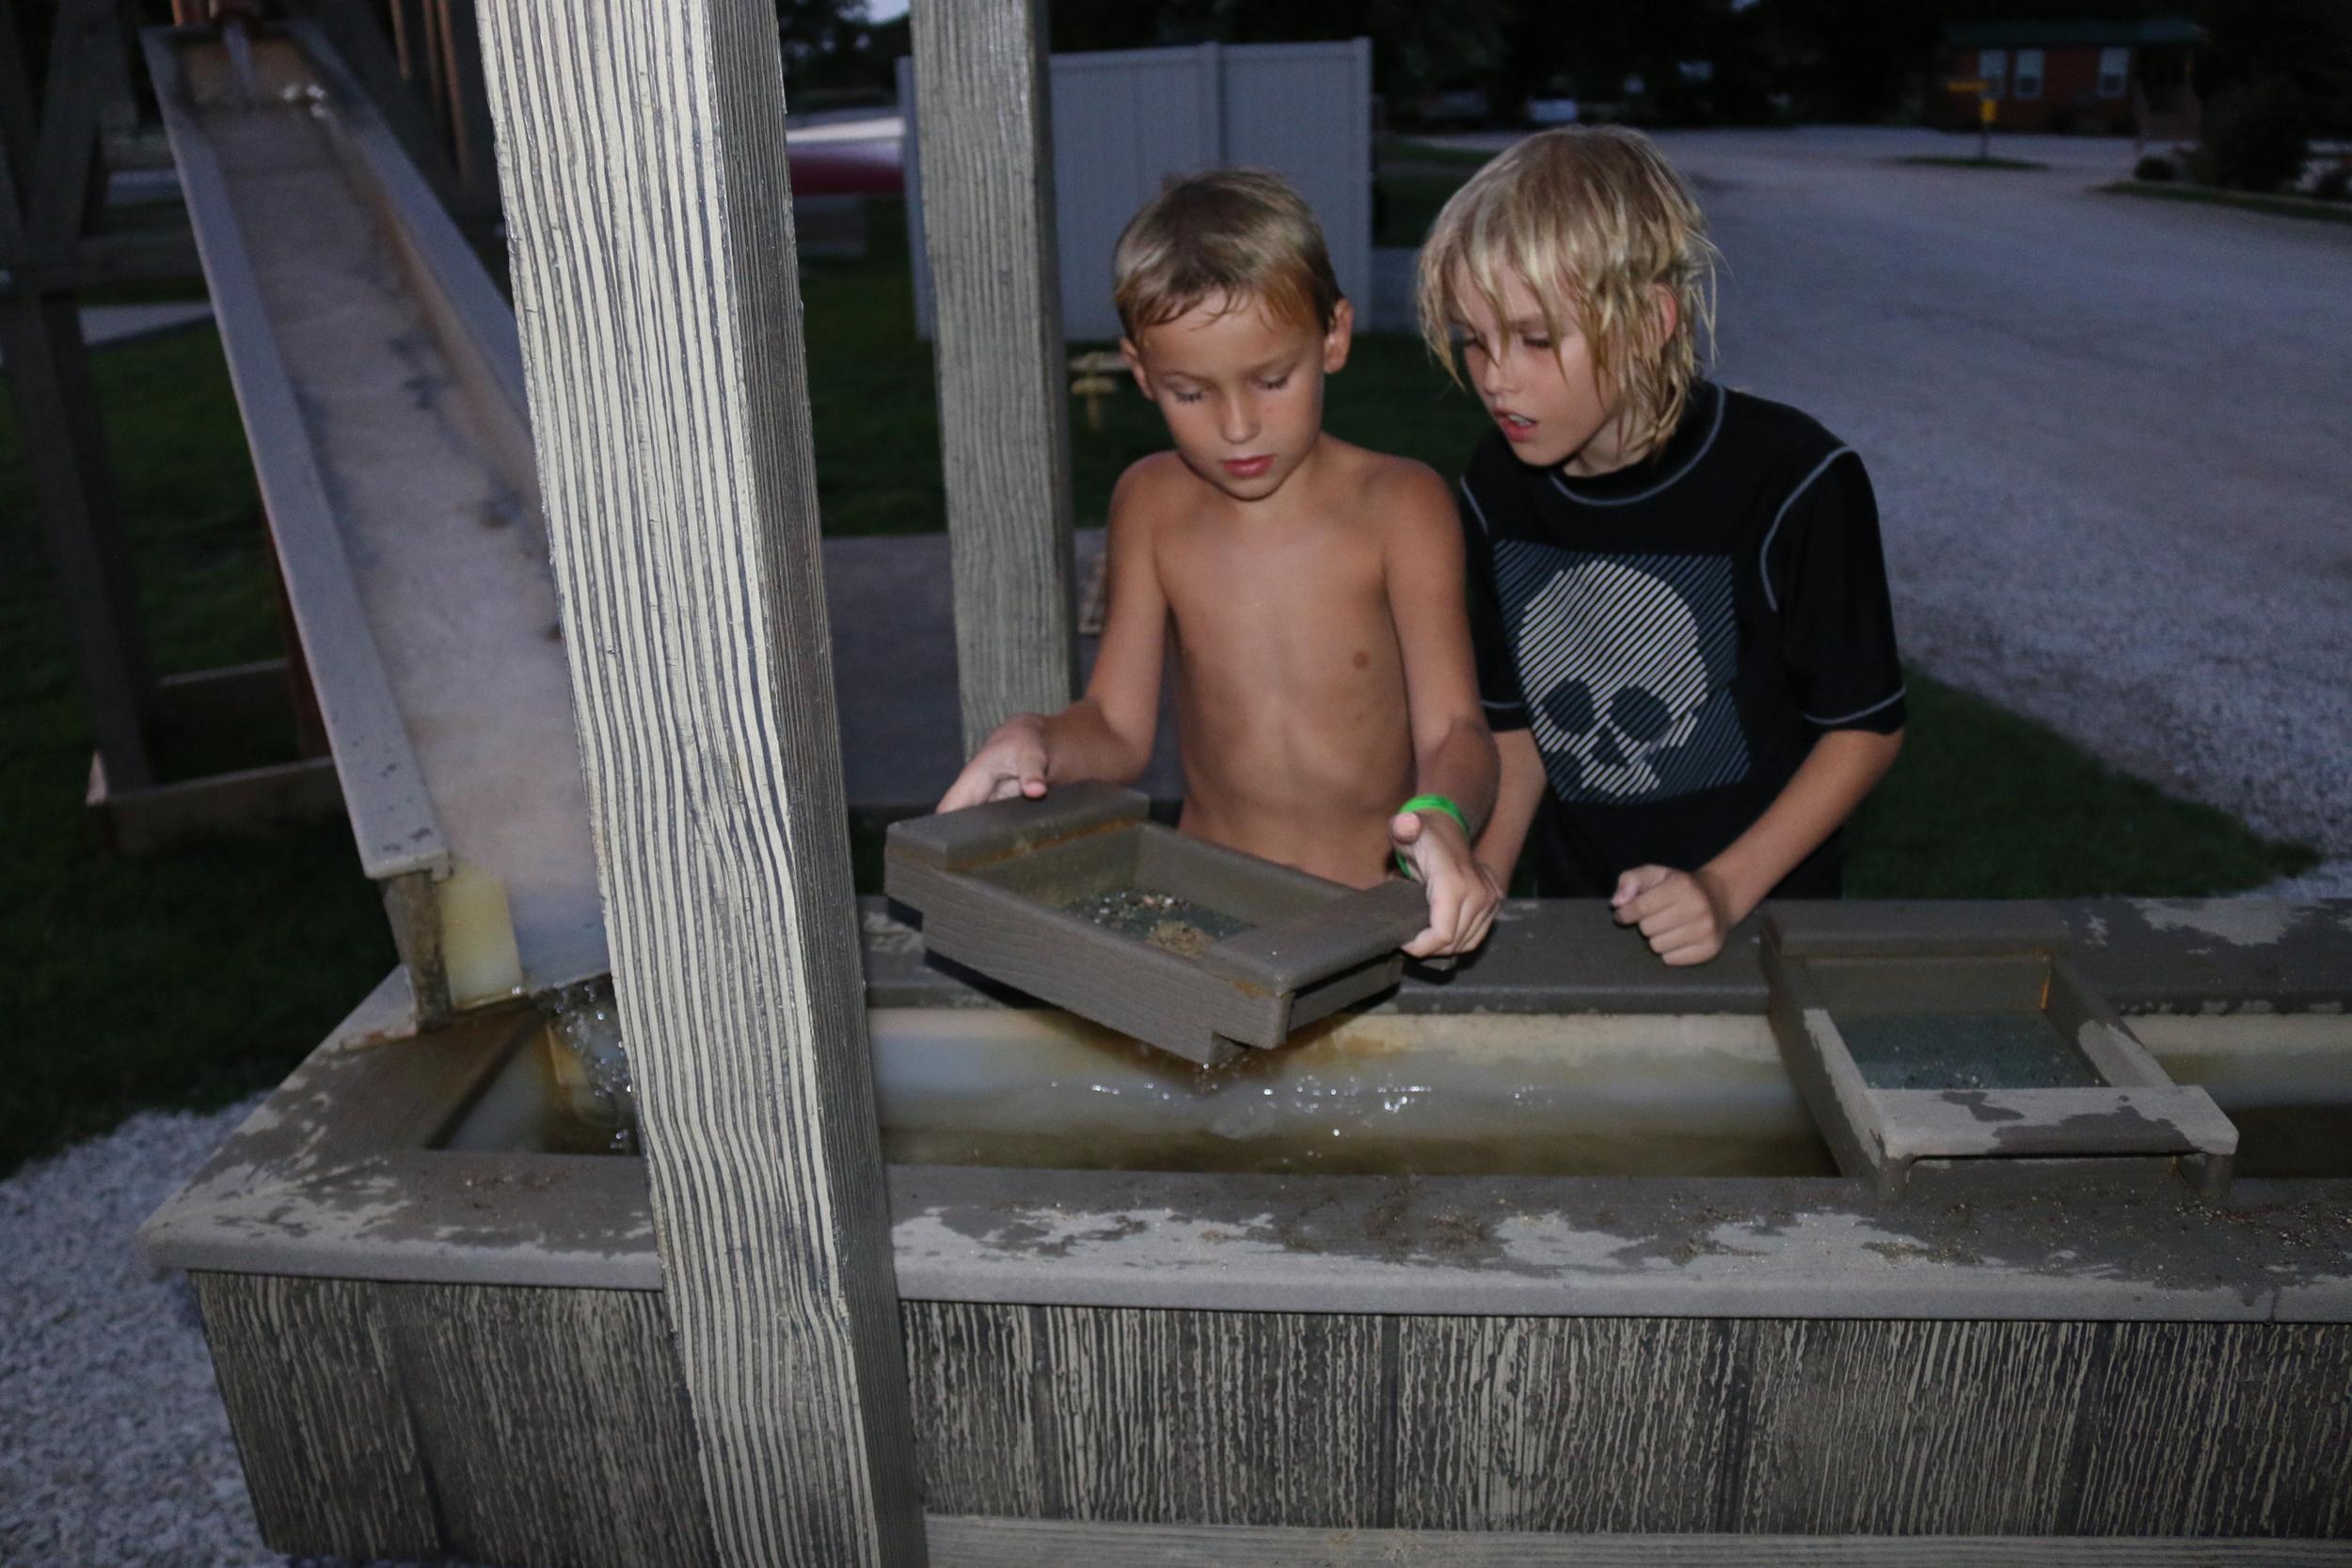 Gold panning - at the KOA campground!